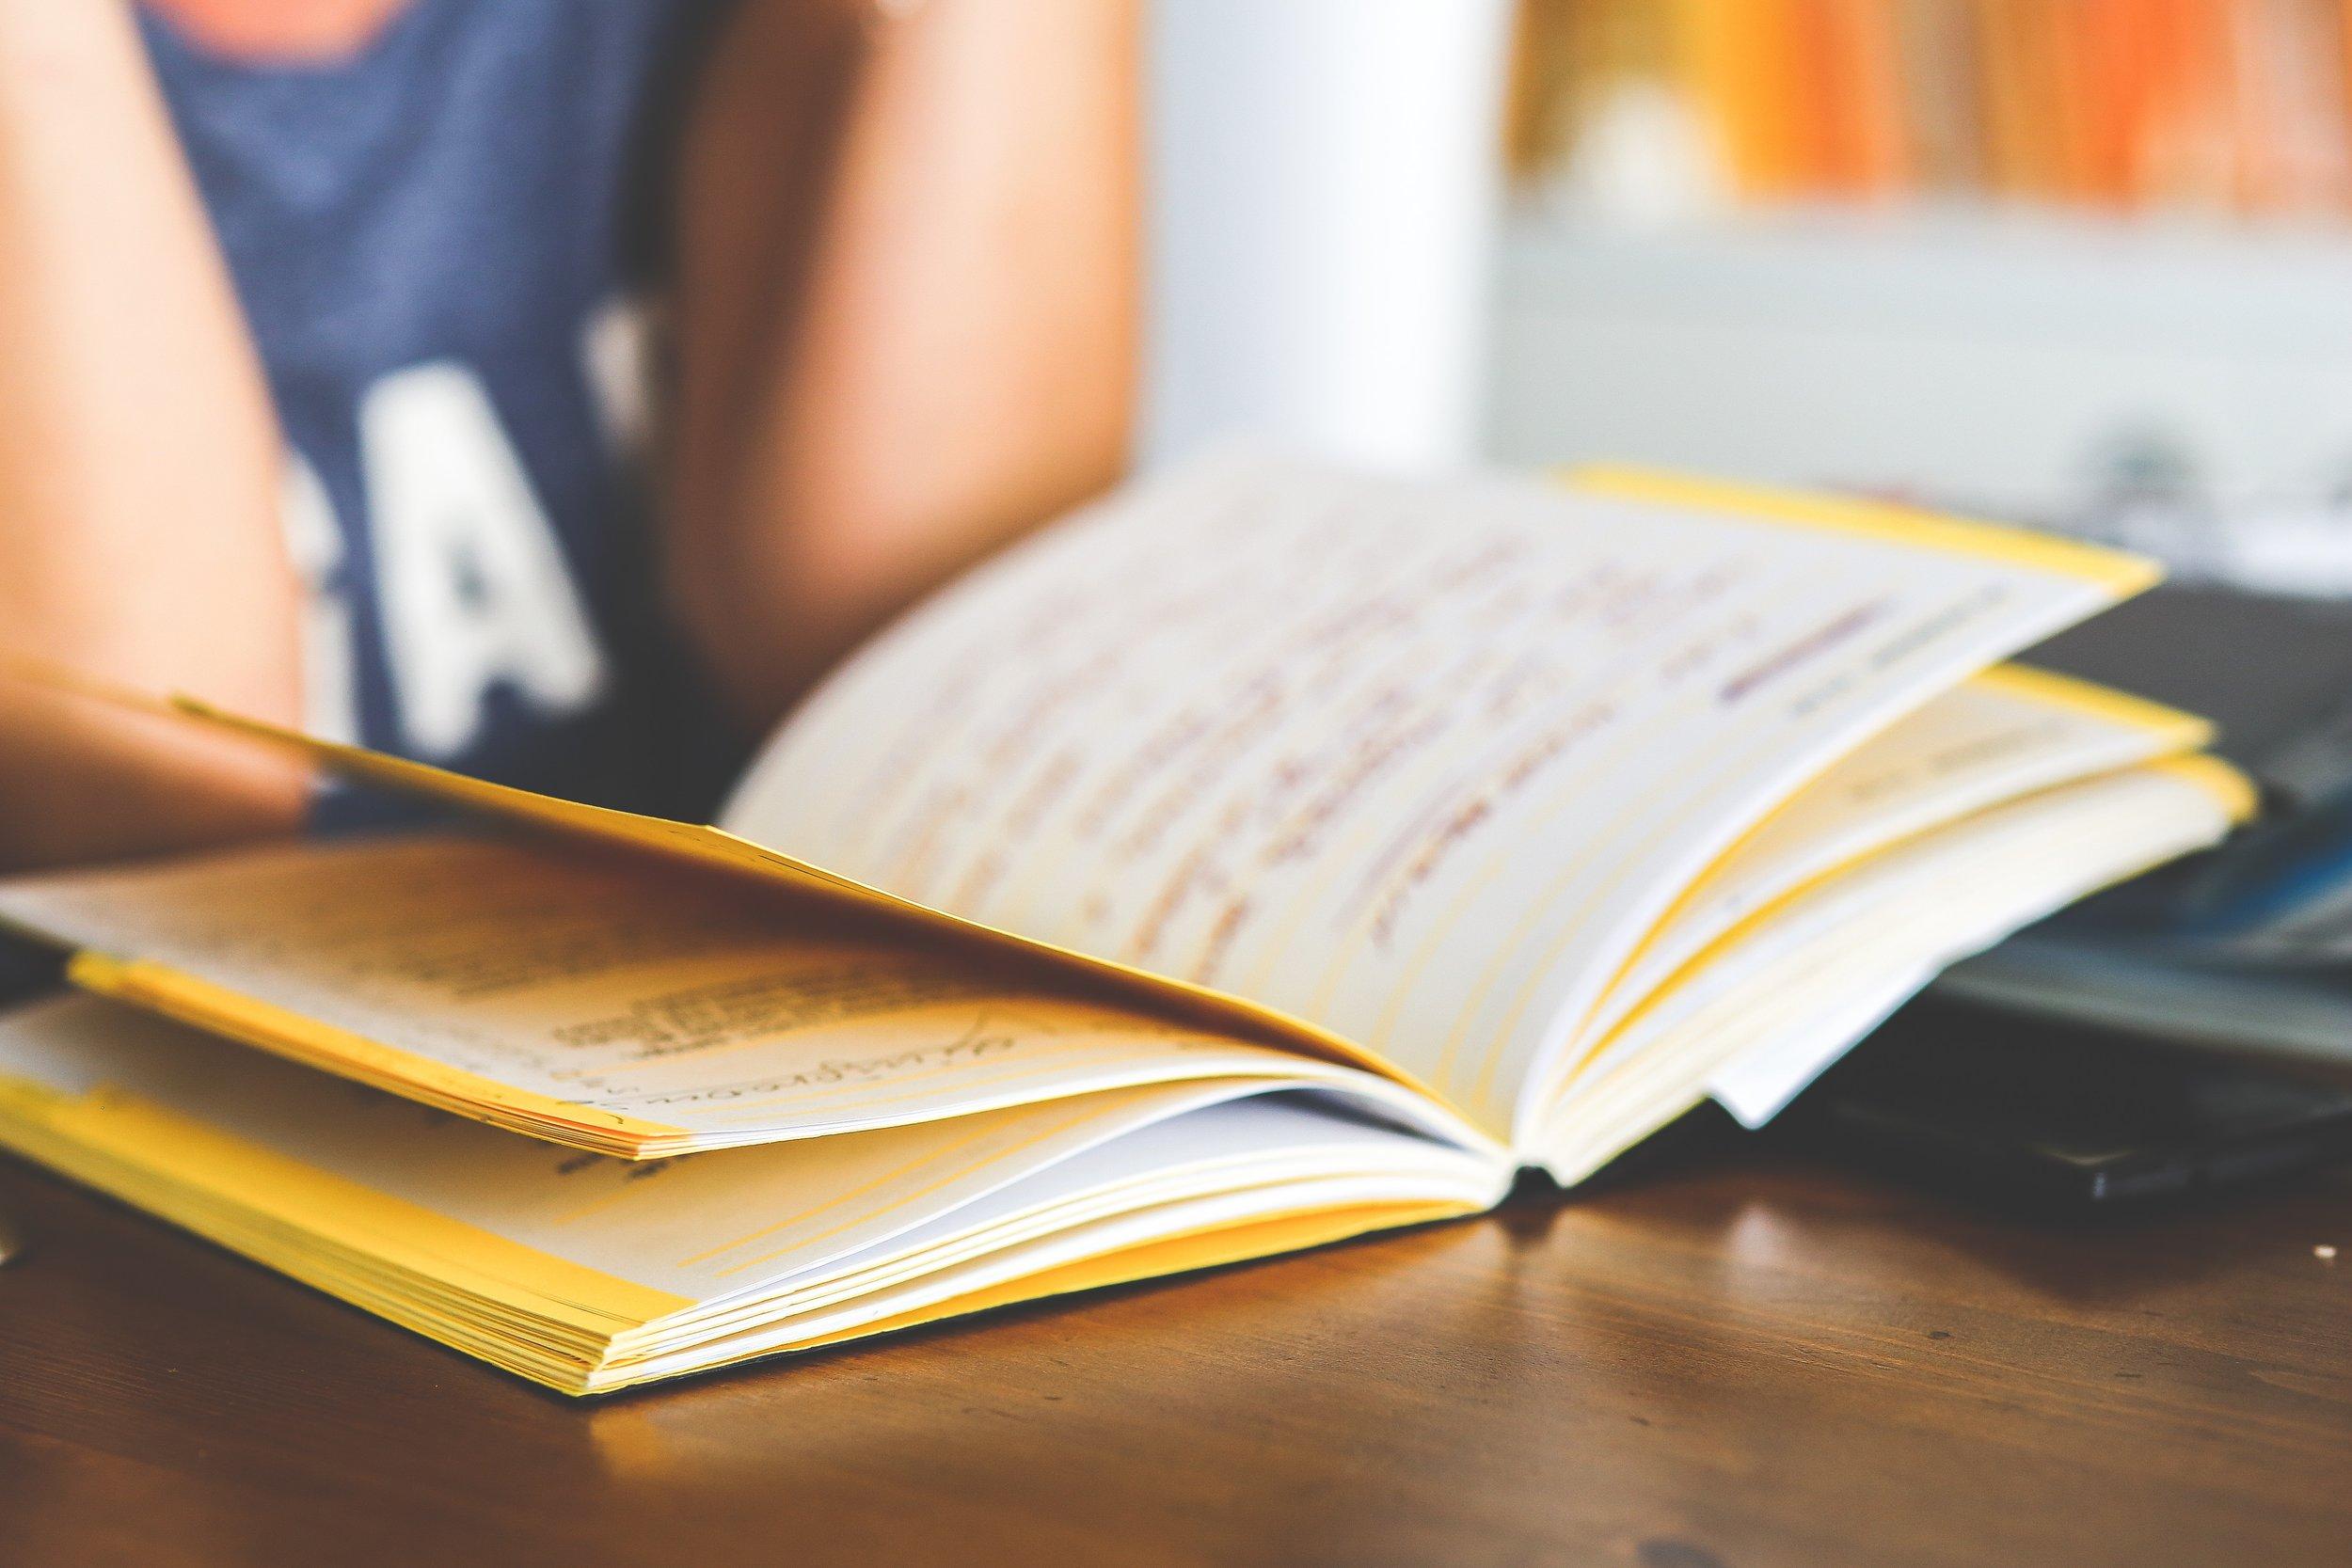 Fewer than 40% of Latino, Black, American Indian/Alaska Native, and Native Hawaiian/Pacific Islander students met 3rd grade reading standards. -